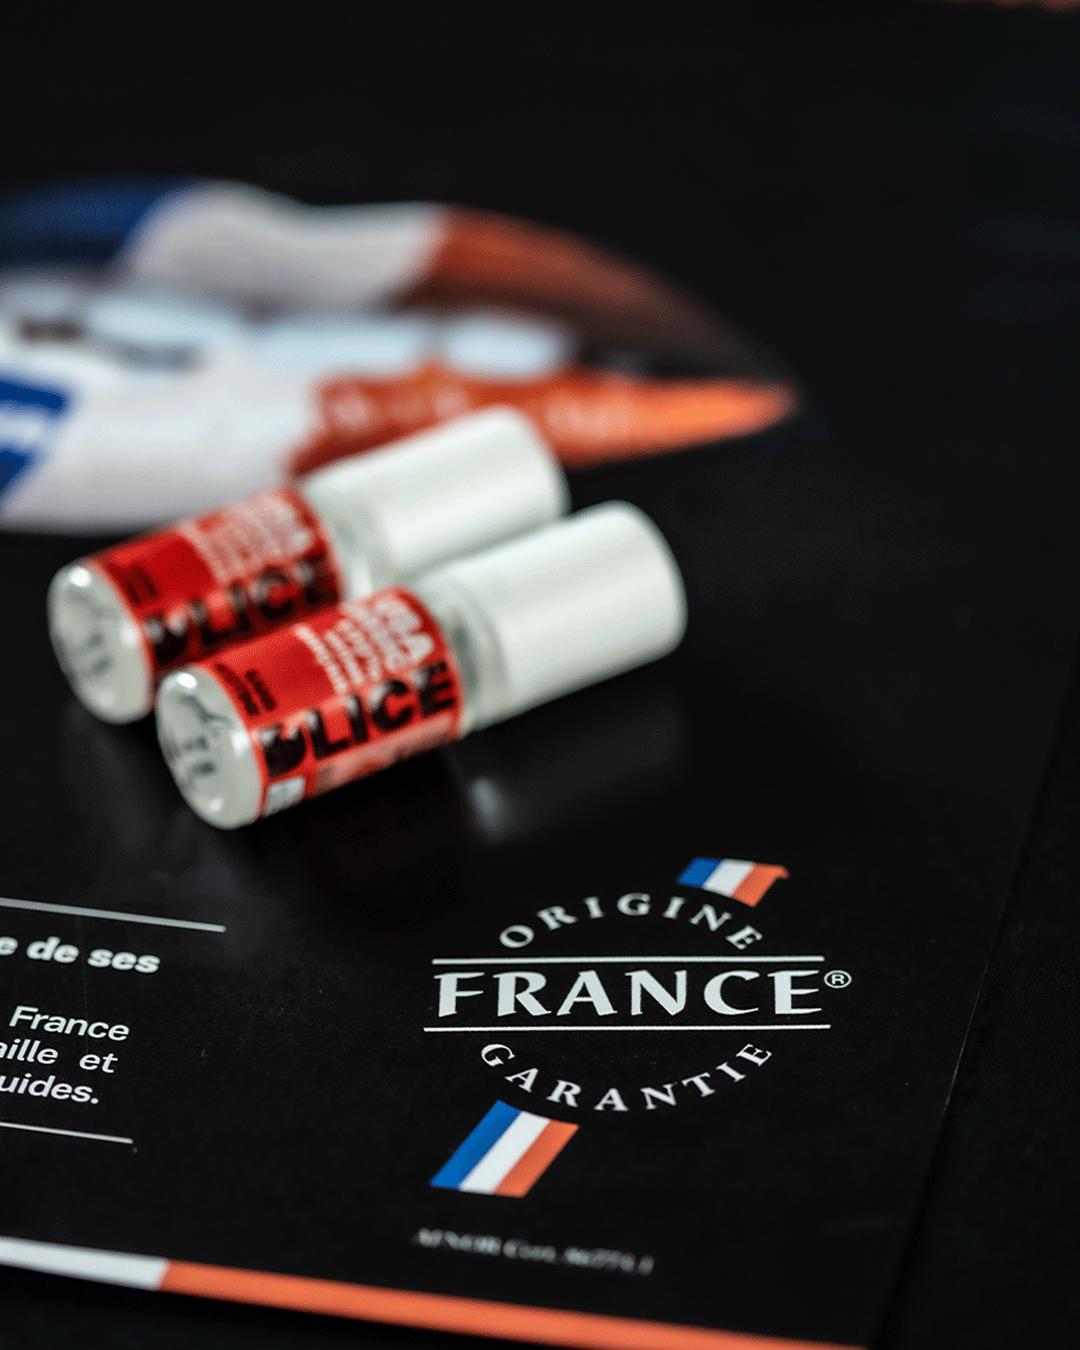 D'LICE est labellisée Origine France Garantie